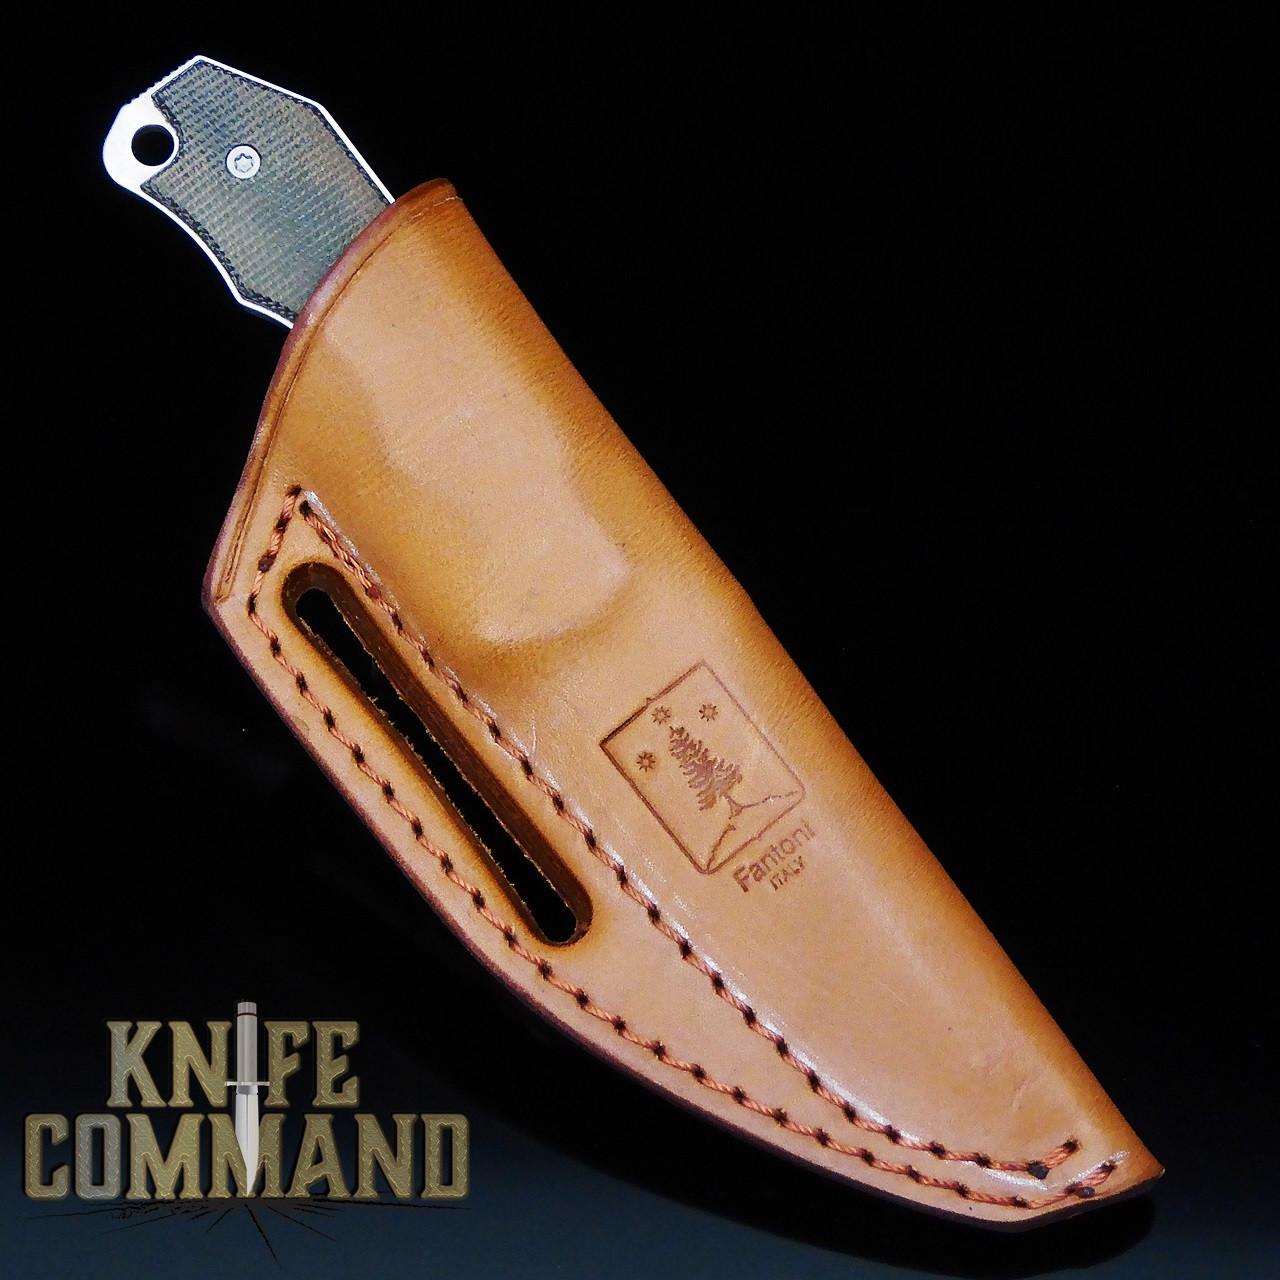 Fantoni Hide Fixed Blade Knife Micarta CPM-S30V Tommaso Rumici Leather Sheath